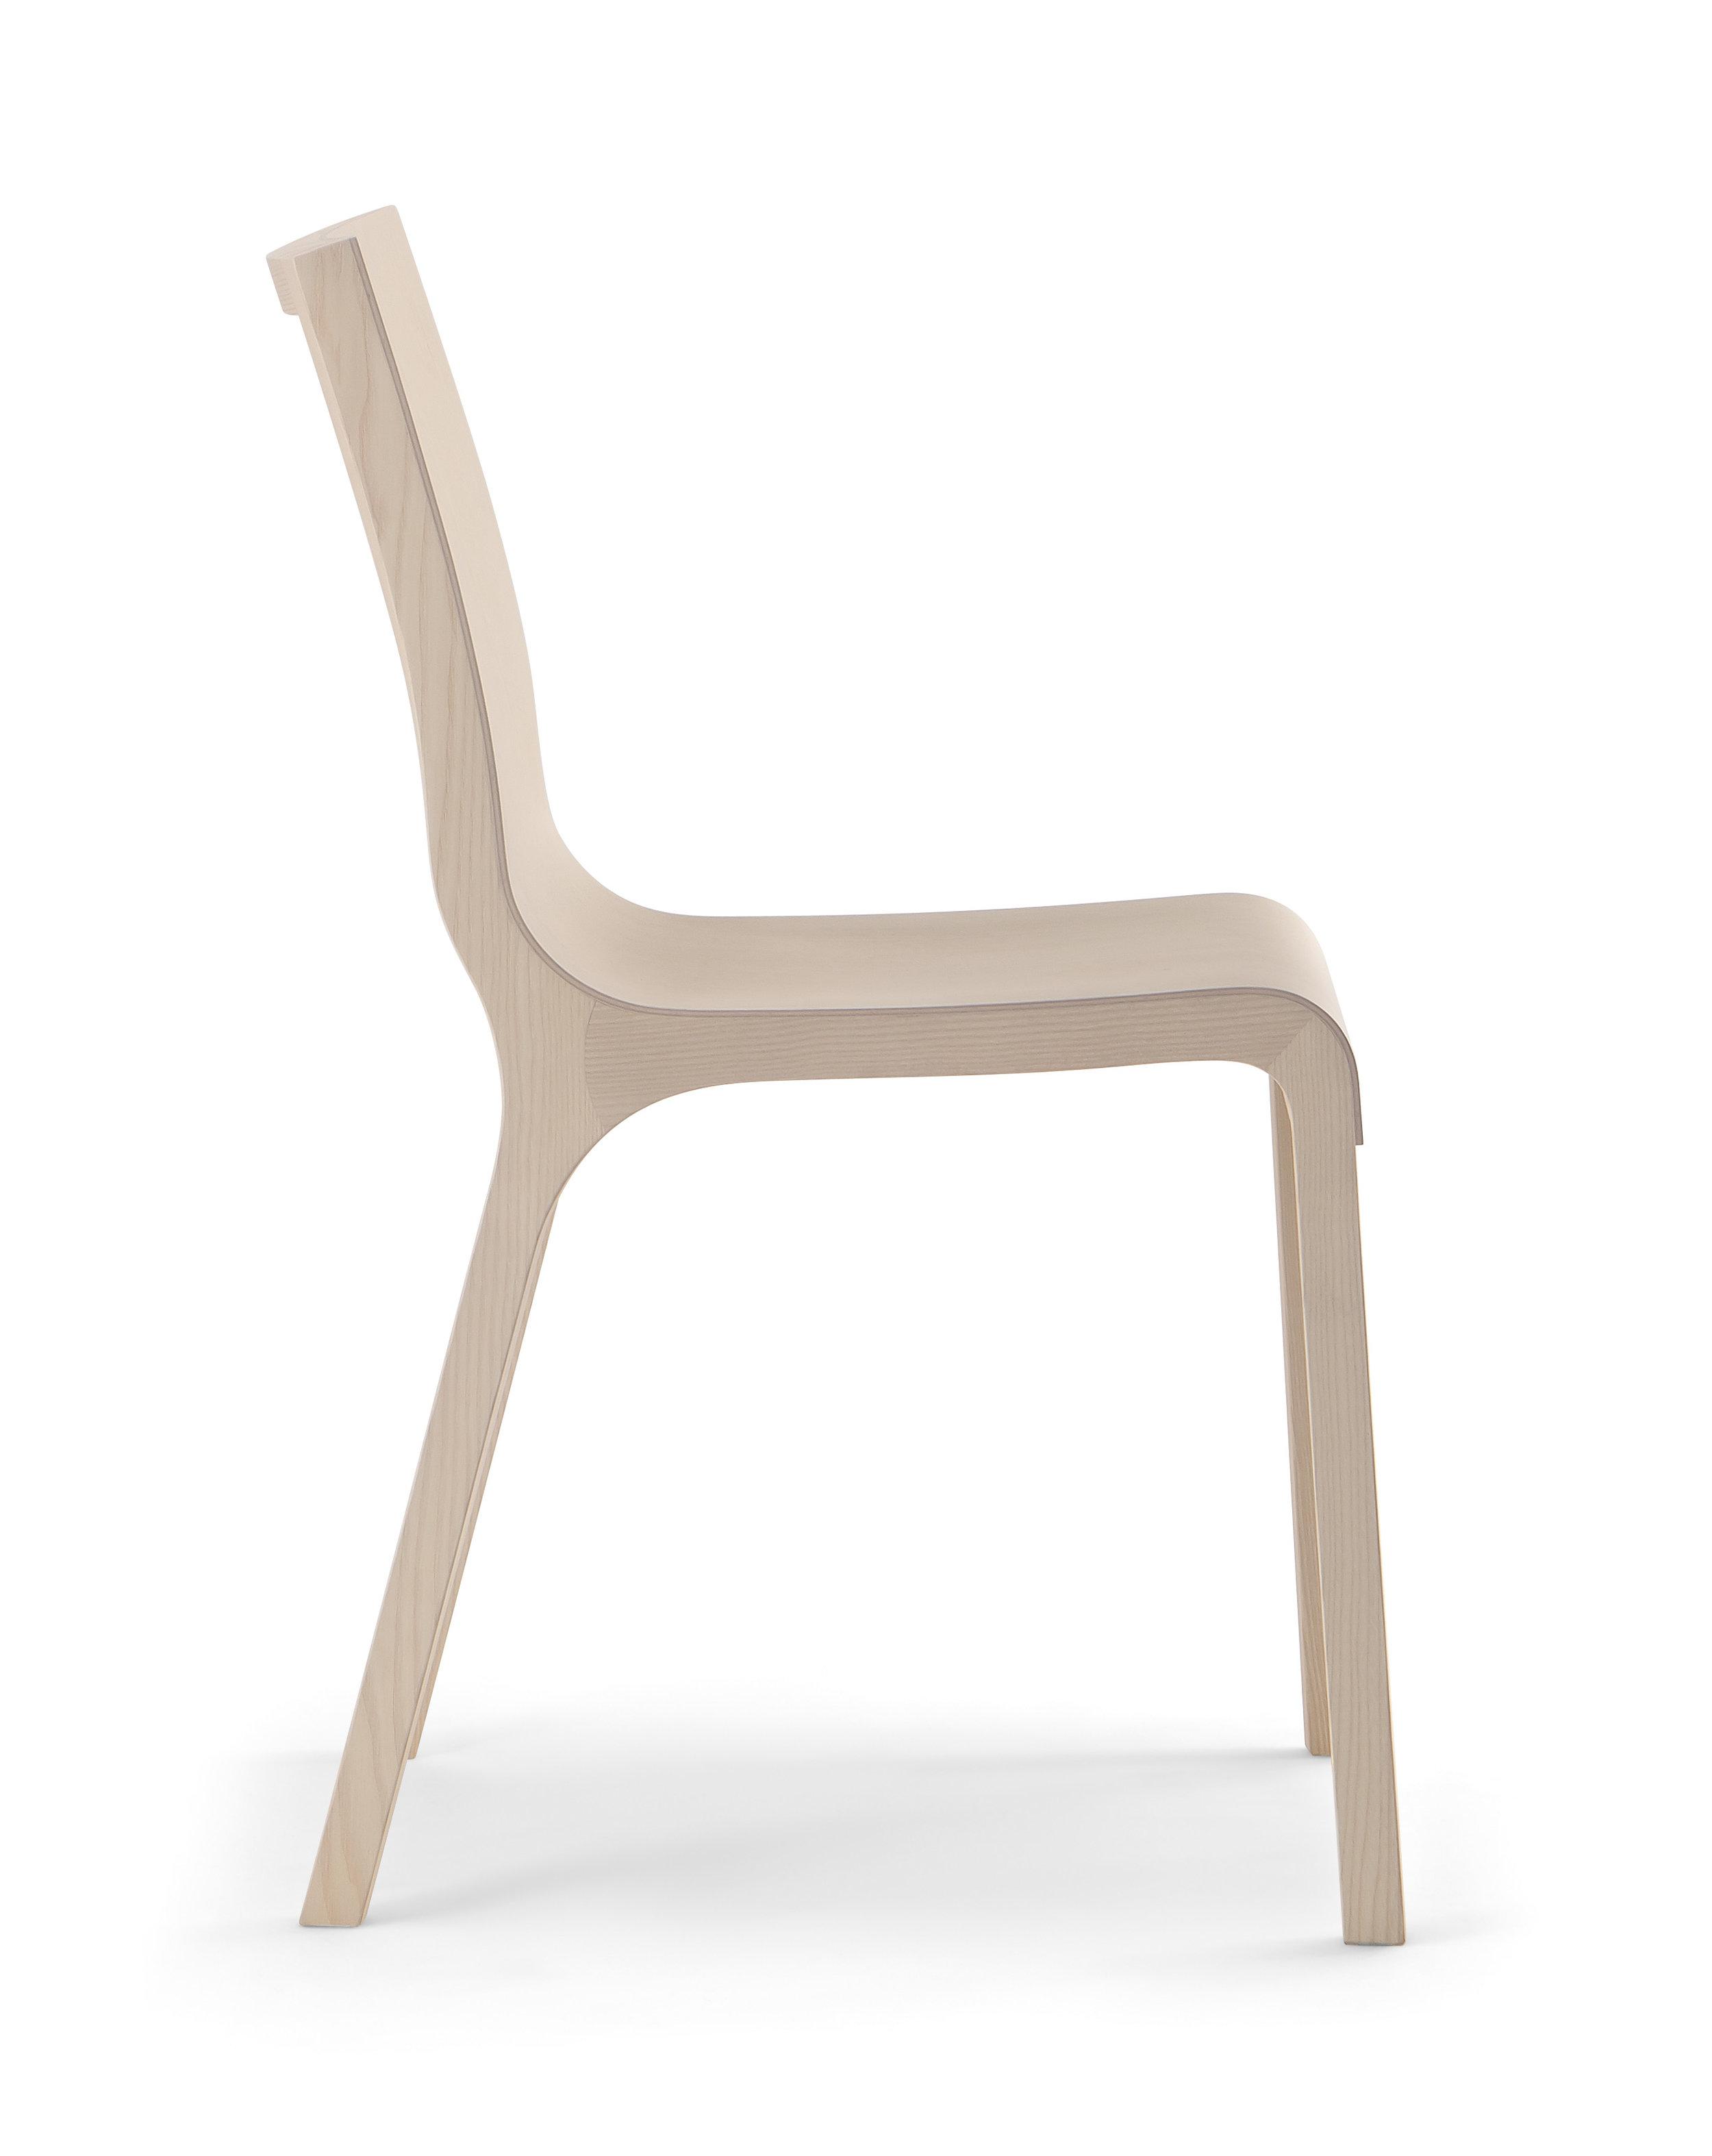 Back Chair - Verti SRL